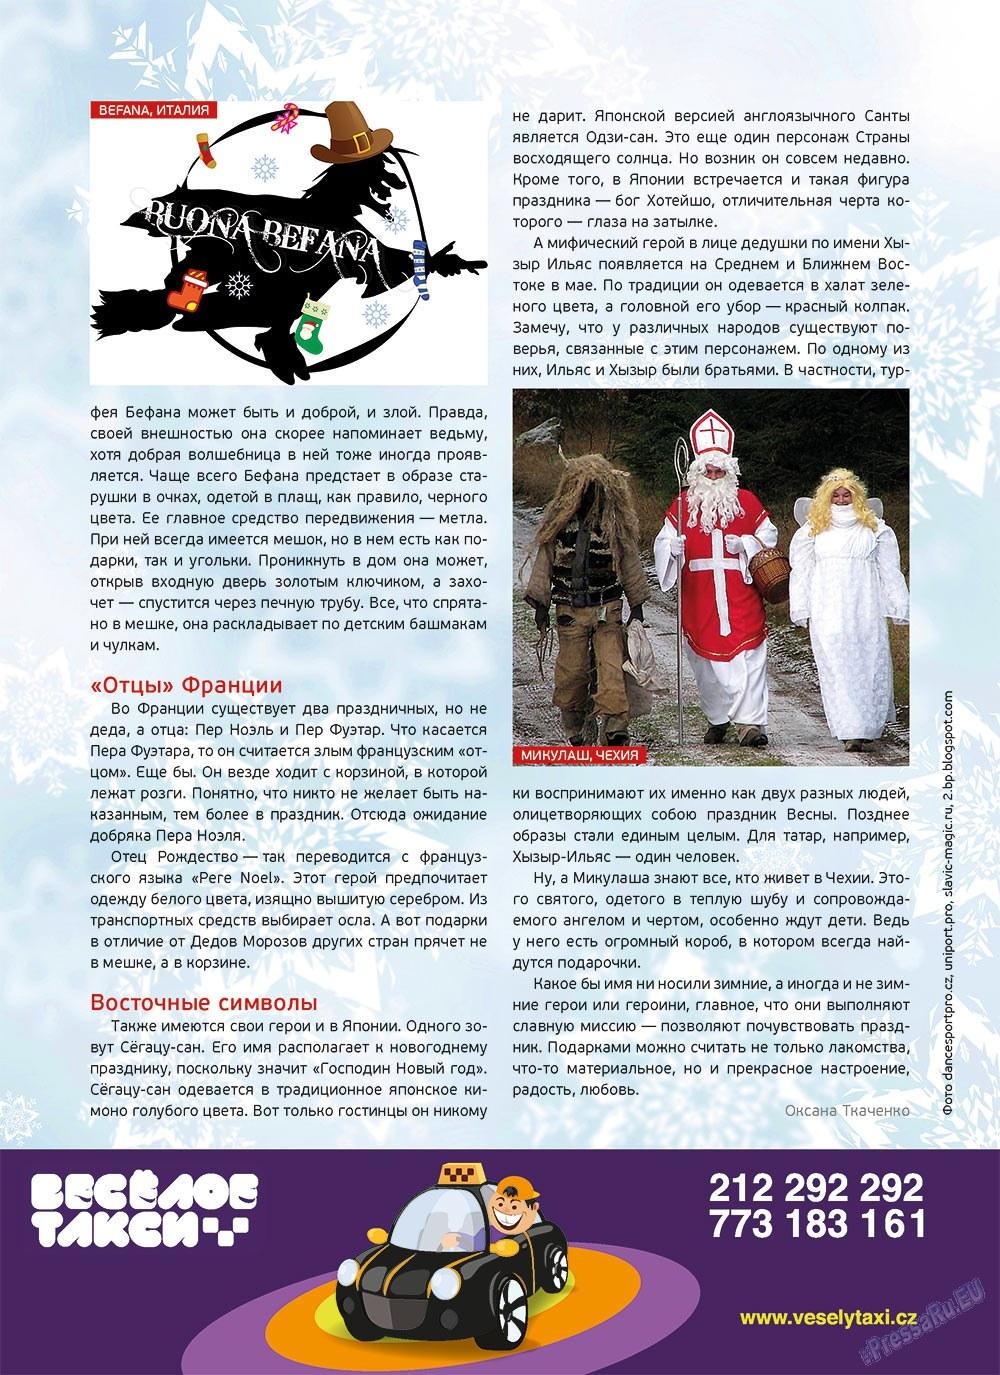 Артек (журнал). 2012 год, номер 6, стр. 25